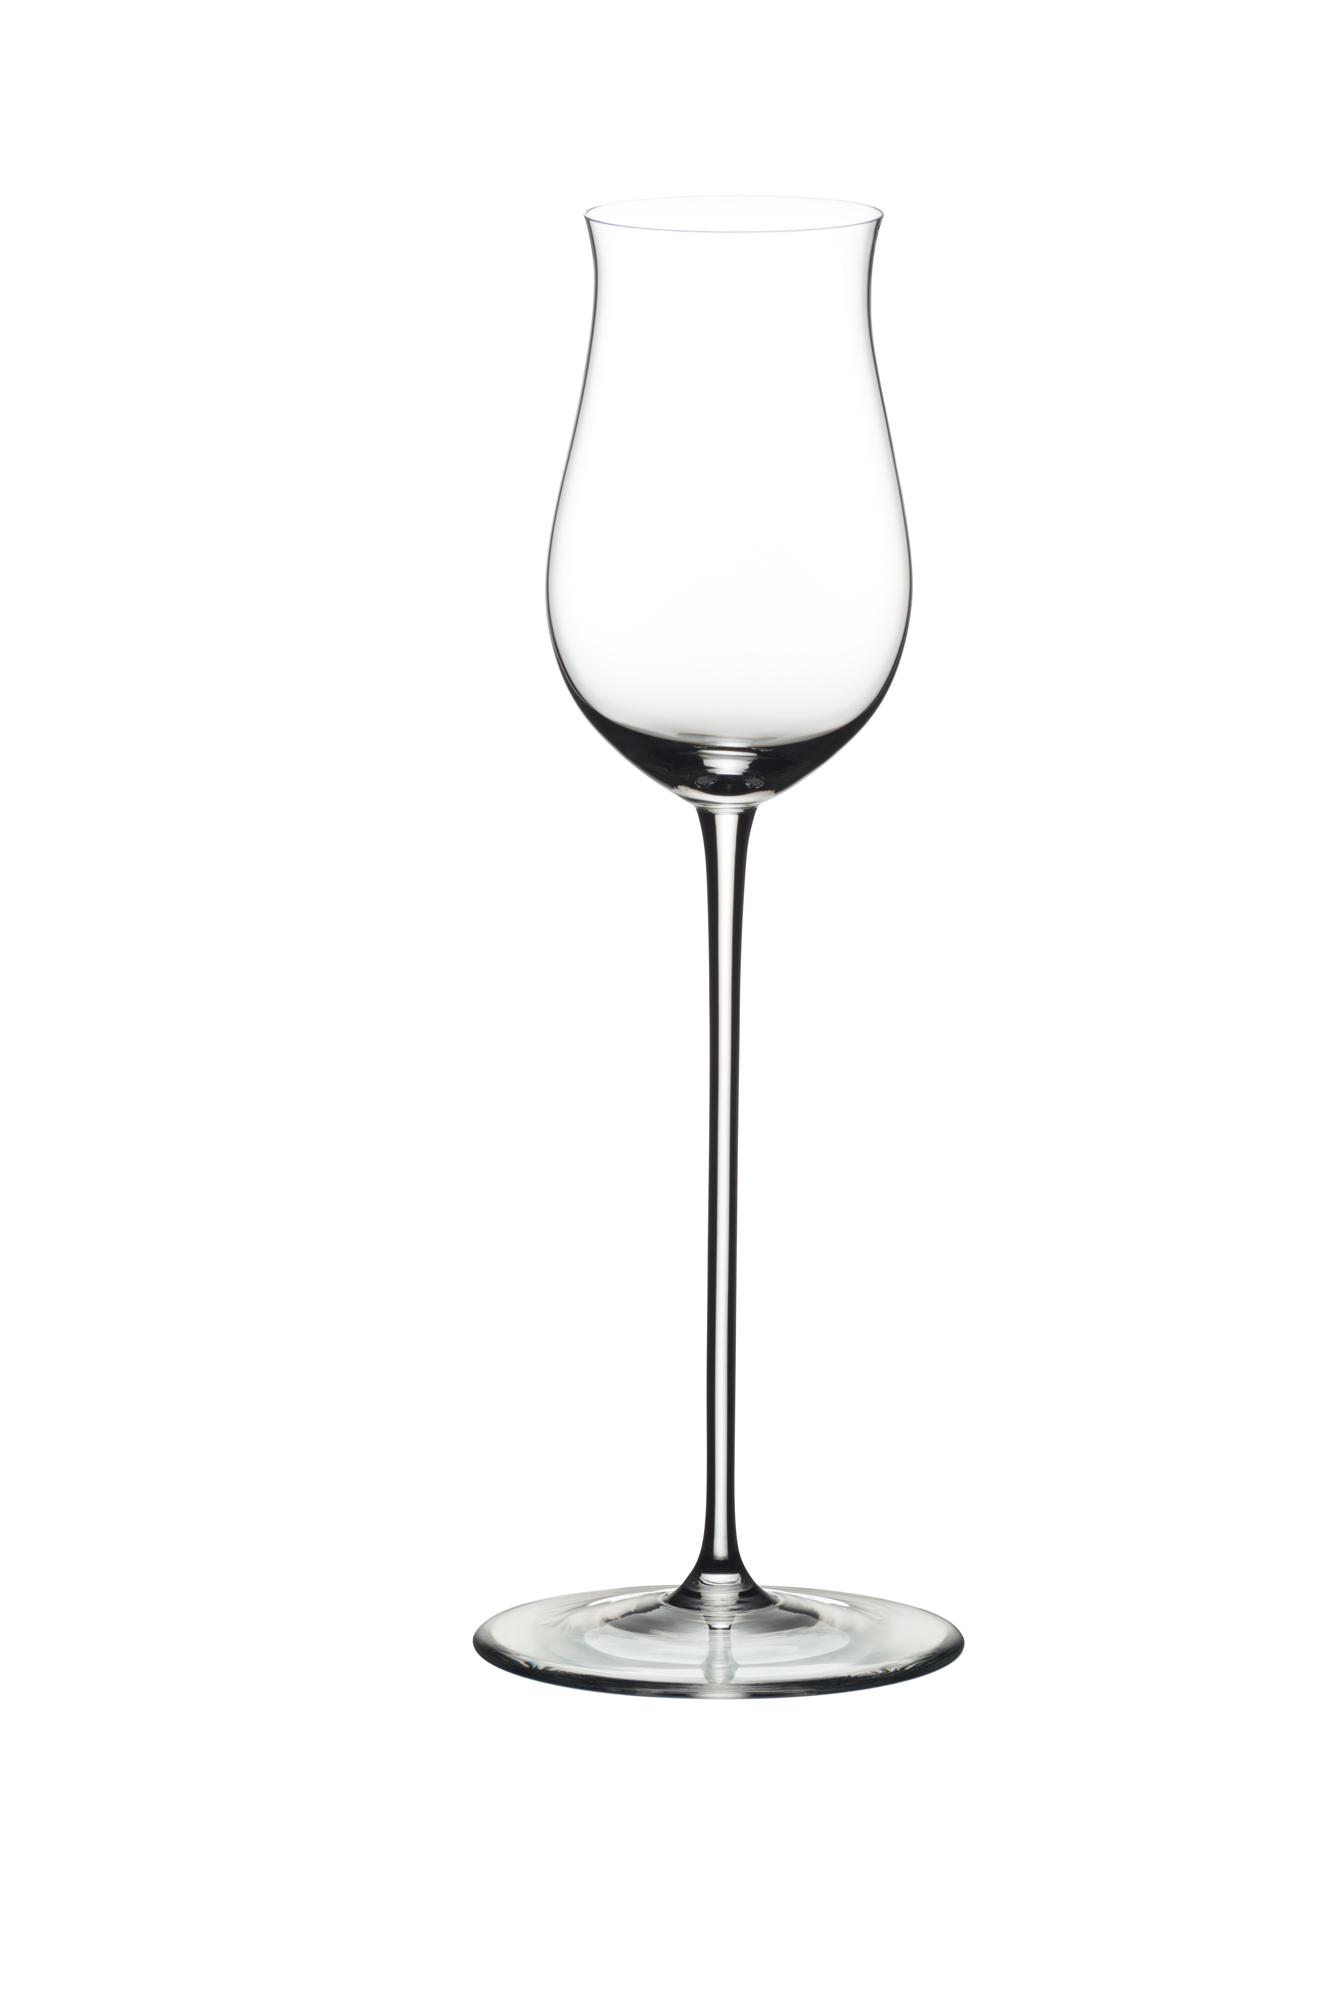 Набор из 2-х бокалов для крепких напитков Riedel Spirits, Riedel Veritas, 152 мл riedel набор бокалов для шерри sherry 260 мл 2 шт 6408 88 riedel